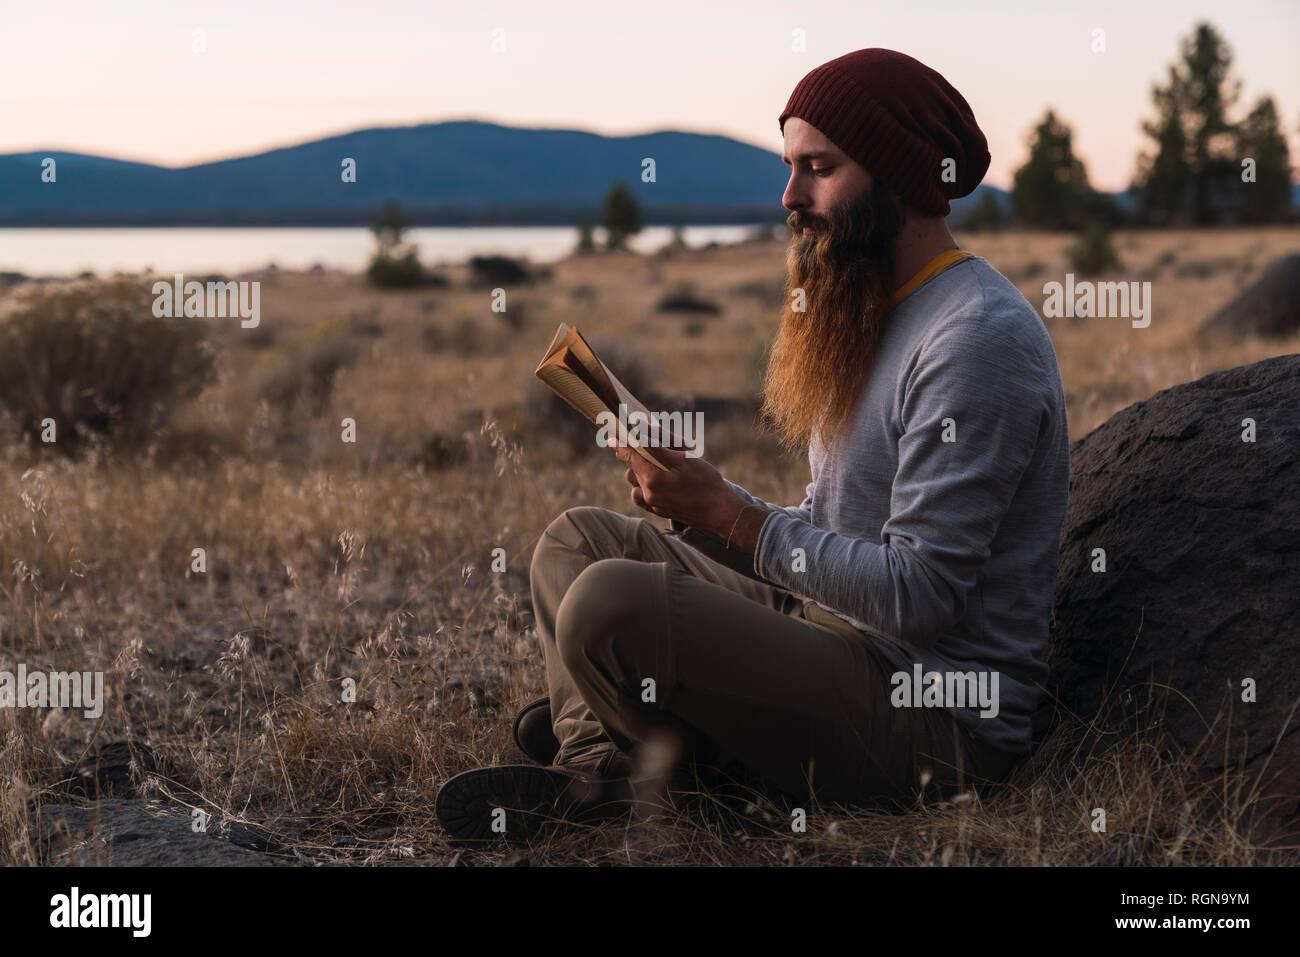 USA, North California, bearded young man reading a book near Lassen Volcanic National Park Stock Photo